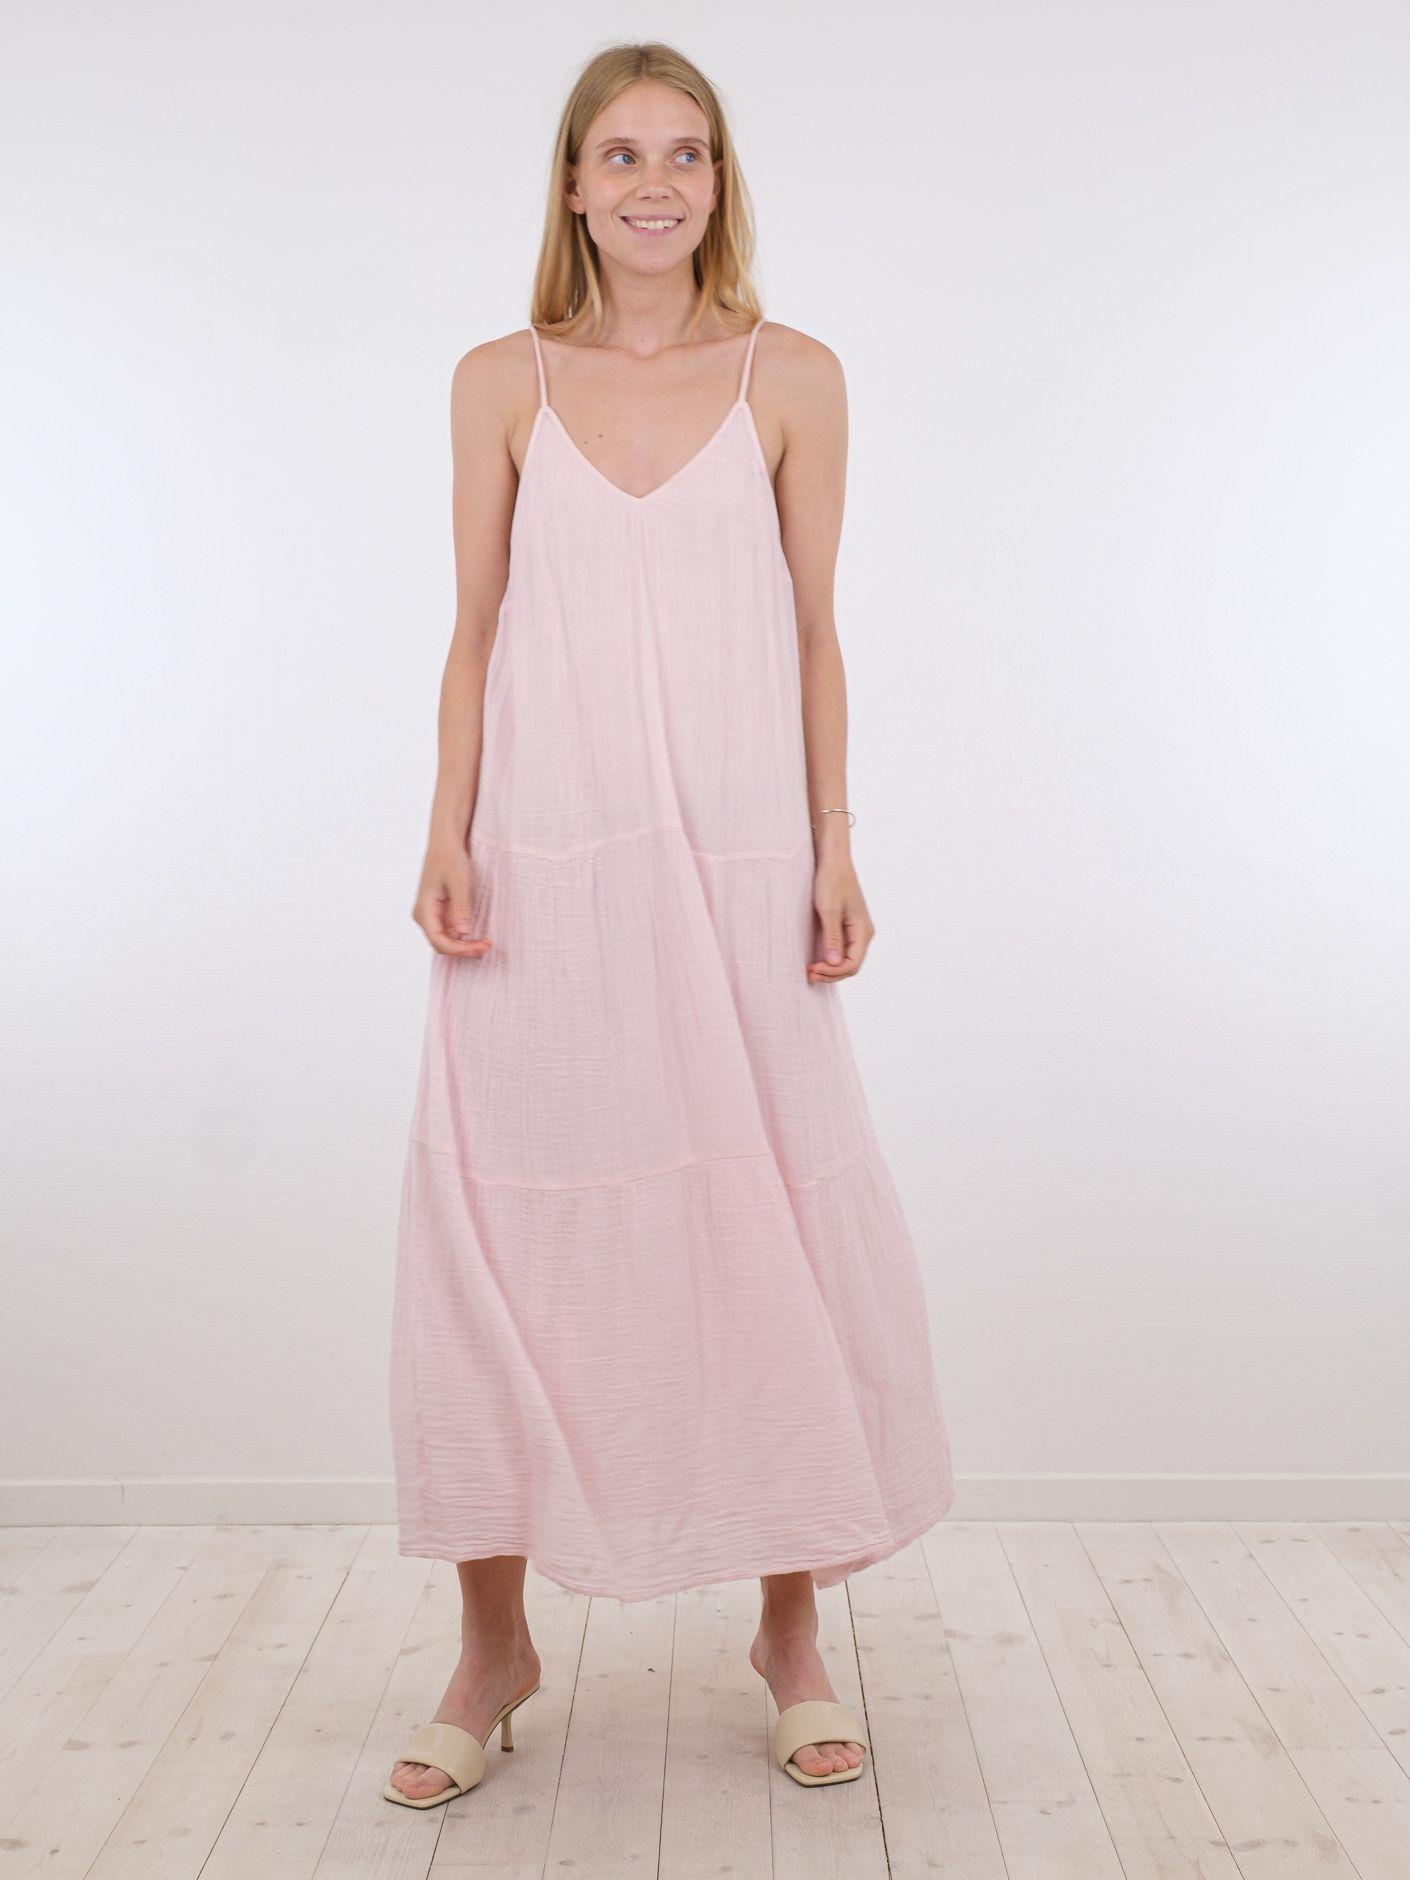 Neo Noir Berna Gauze kjole, light pink, 38